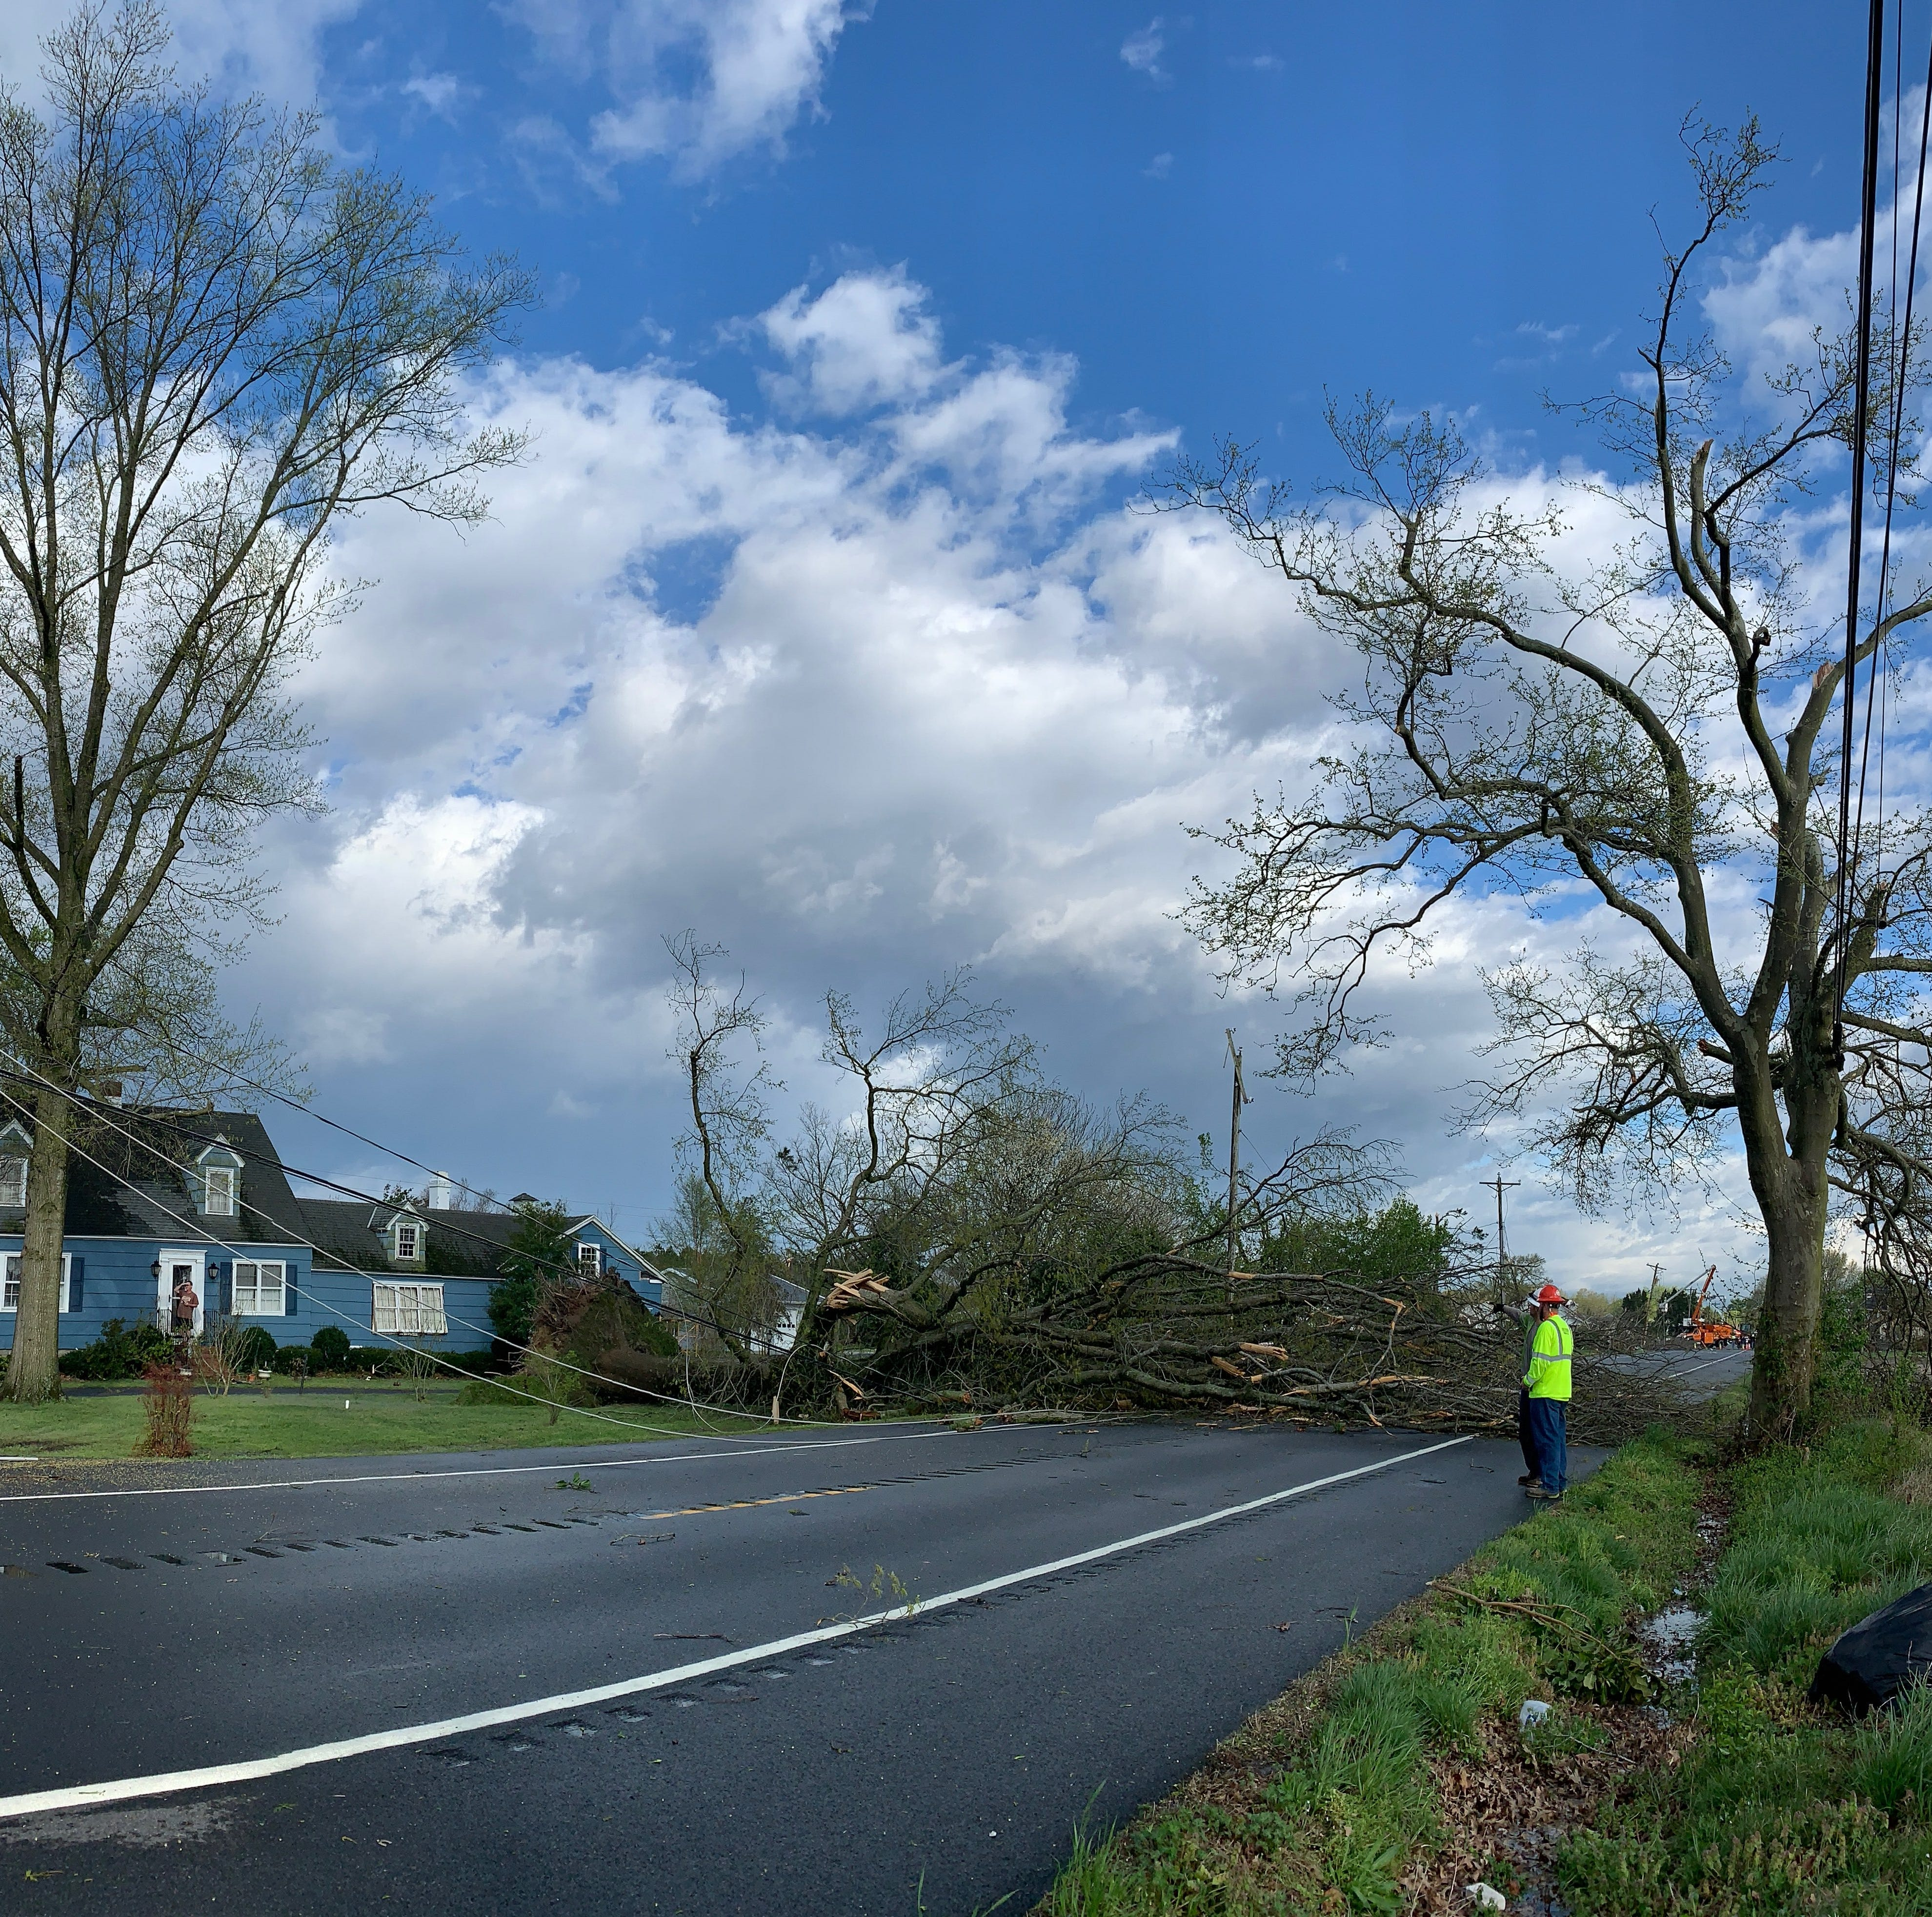 Sussex storm damage: Possible tornado leaves trail of destruction